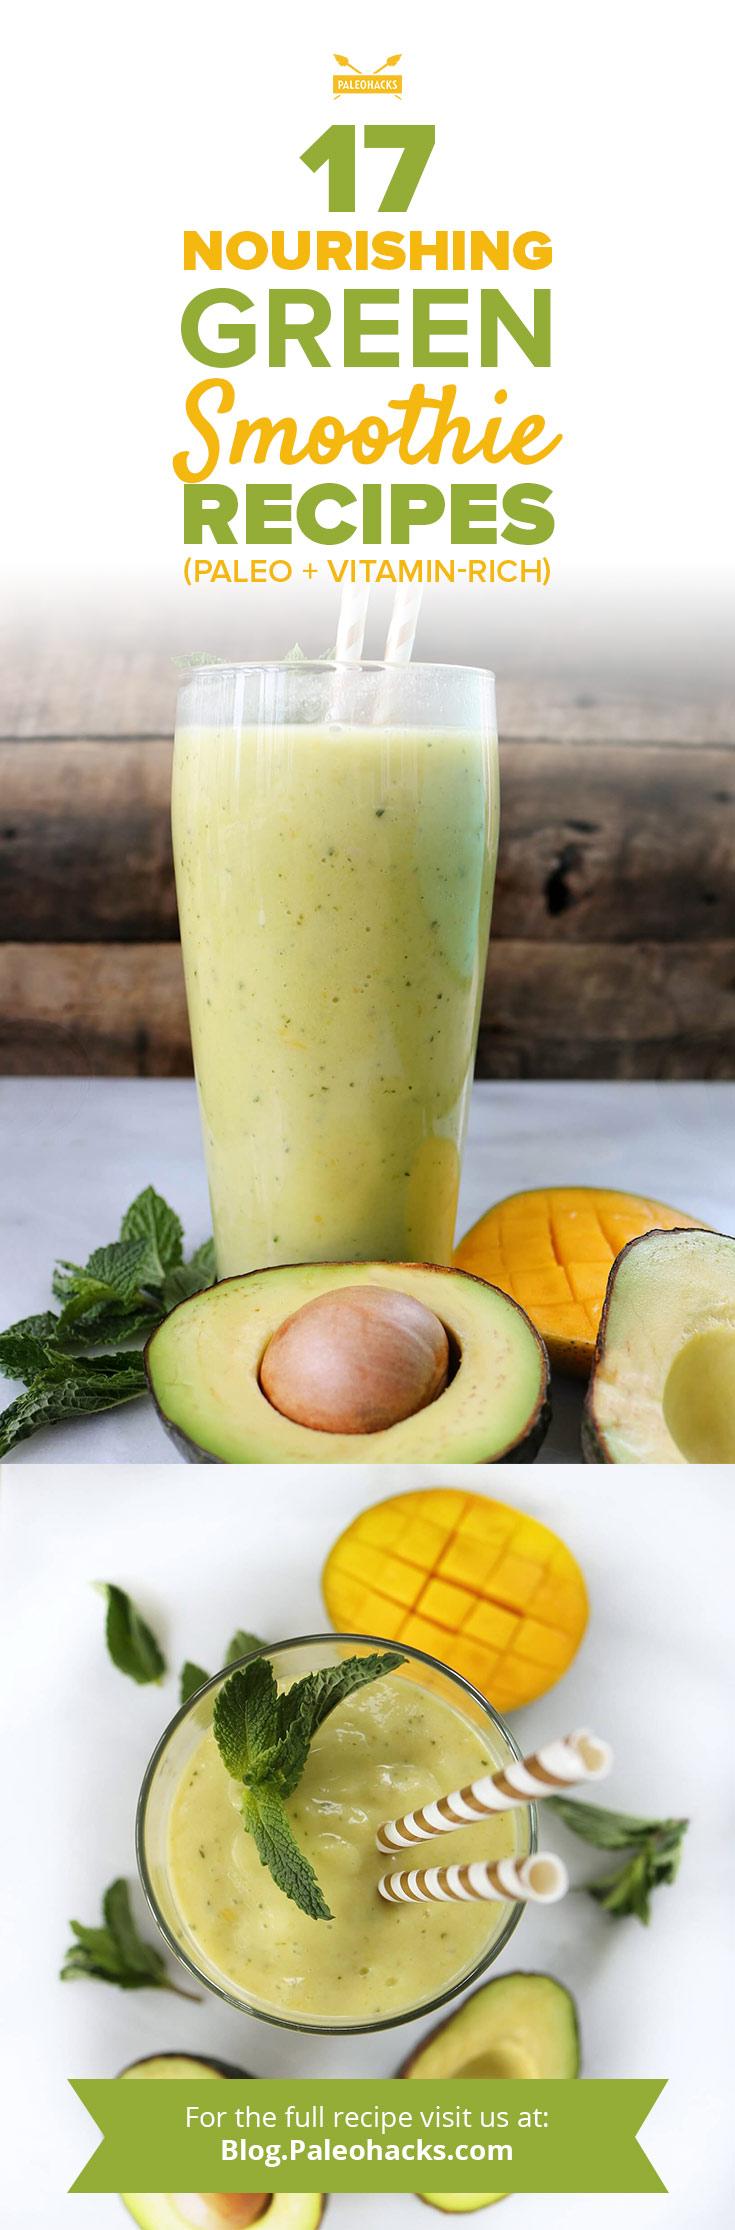 COMPILATION-PIN-17-Nourishing-Green-Smoothie-Recipes.jpg